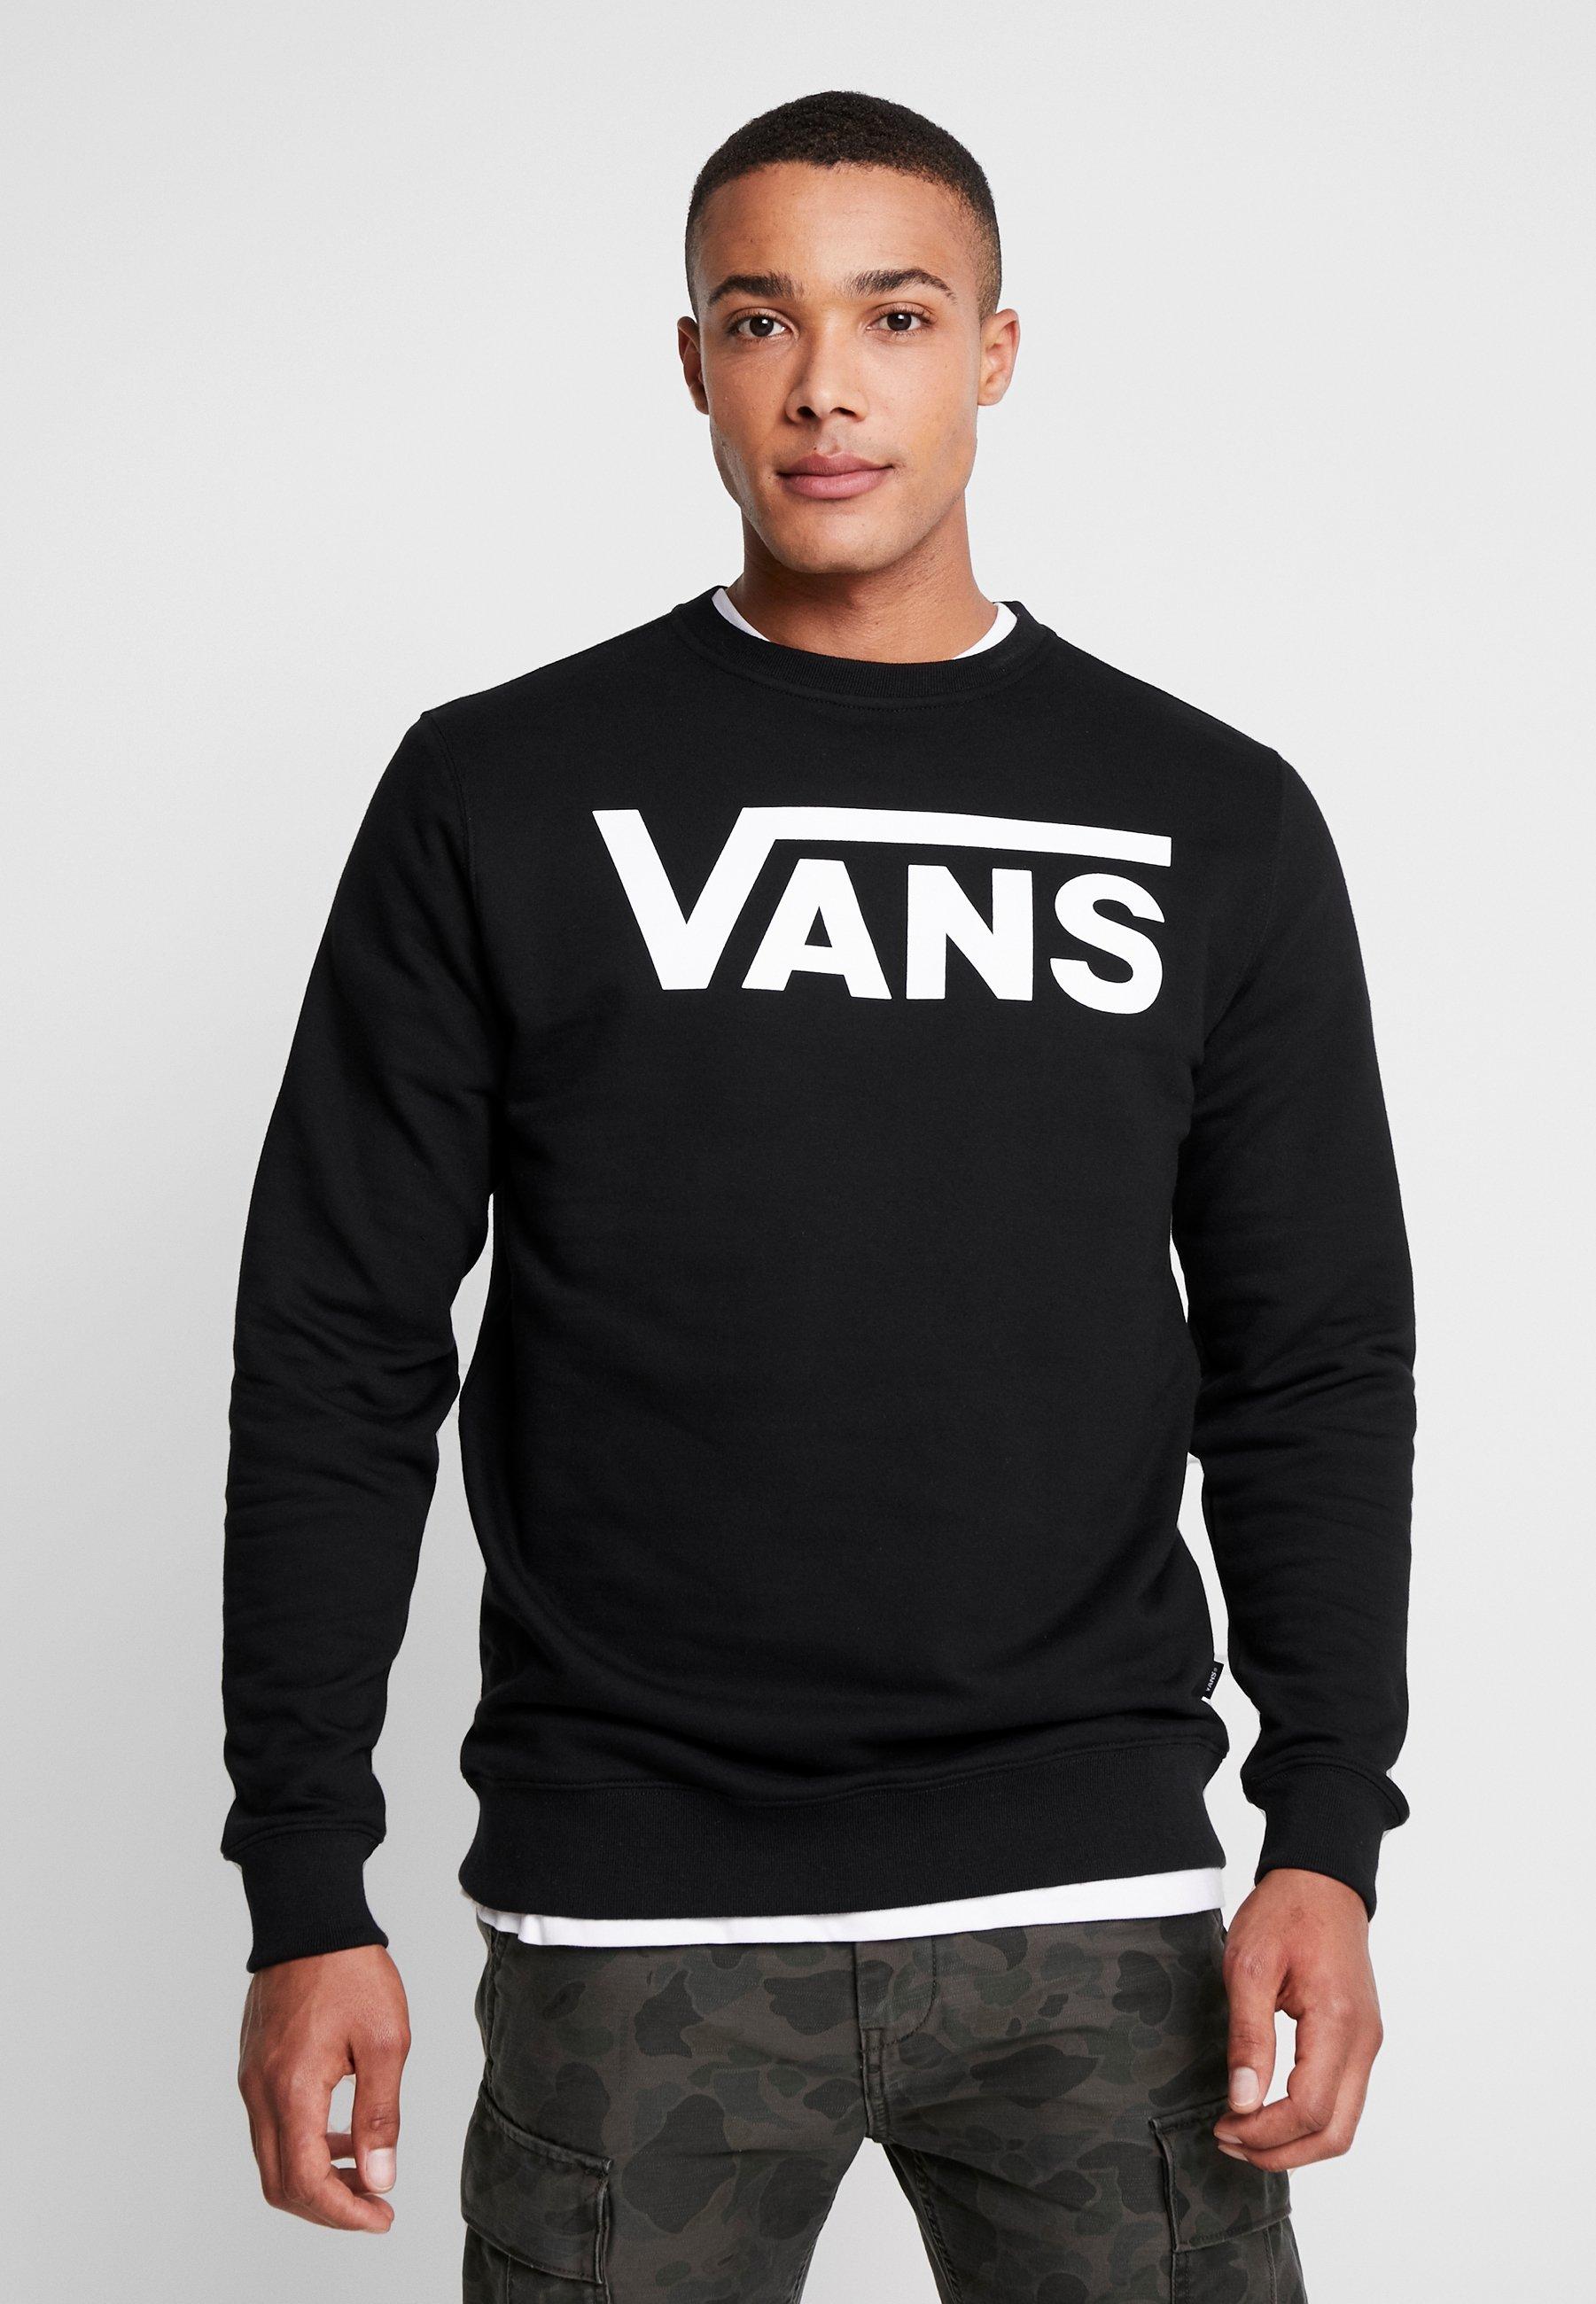 Classic Crew IiSweatshirt Black Vans white tdCsxrhQ